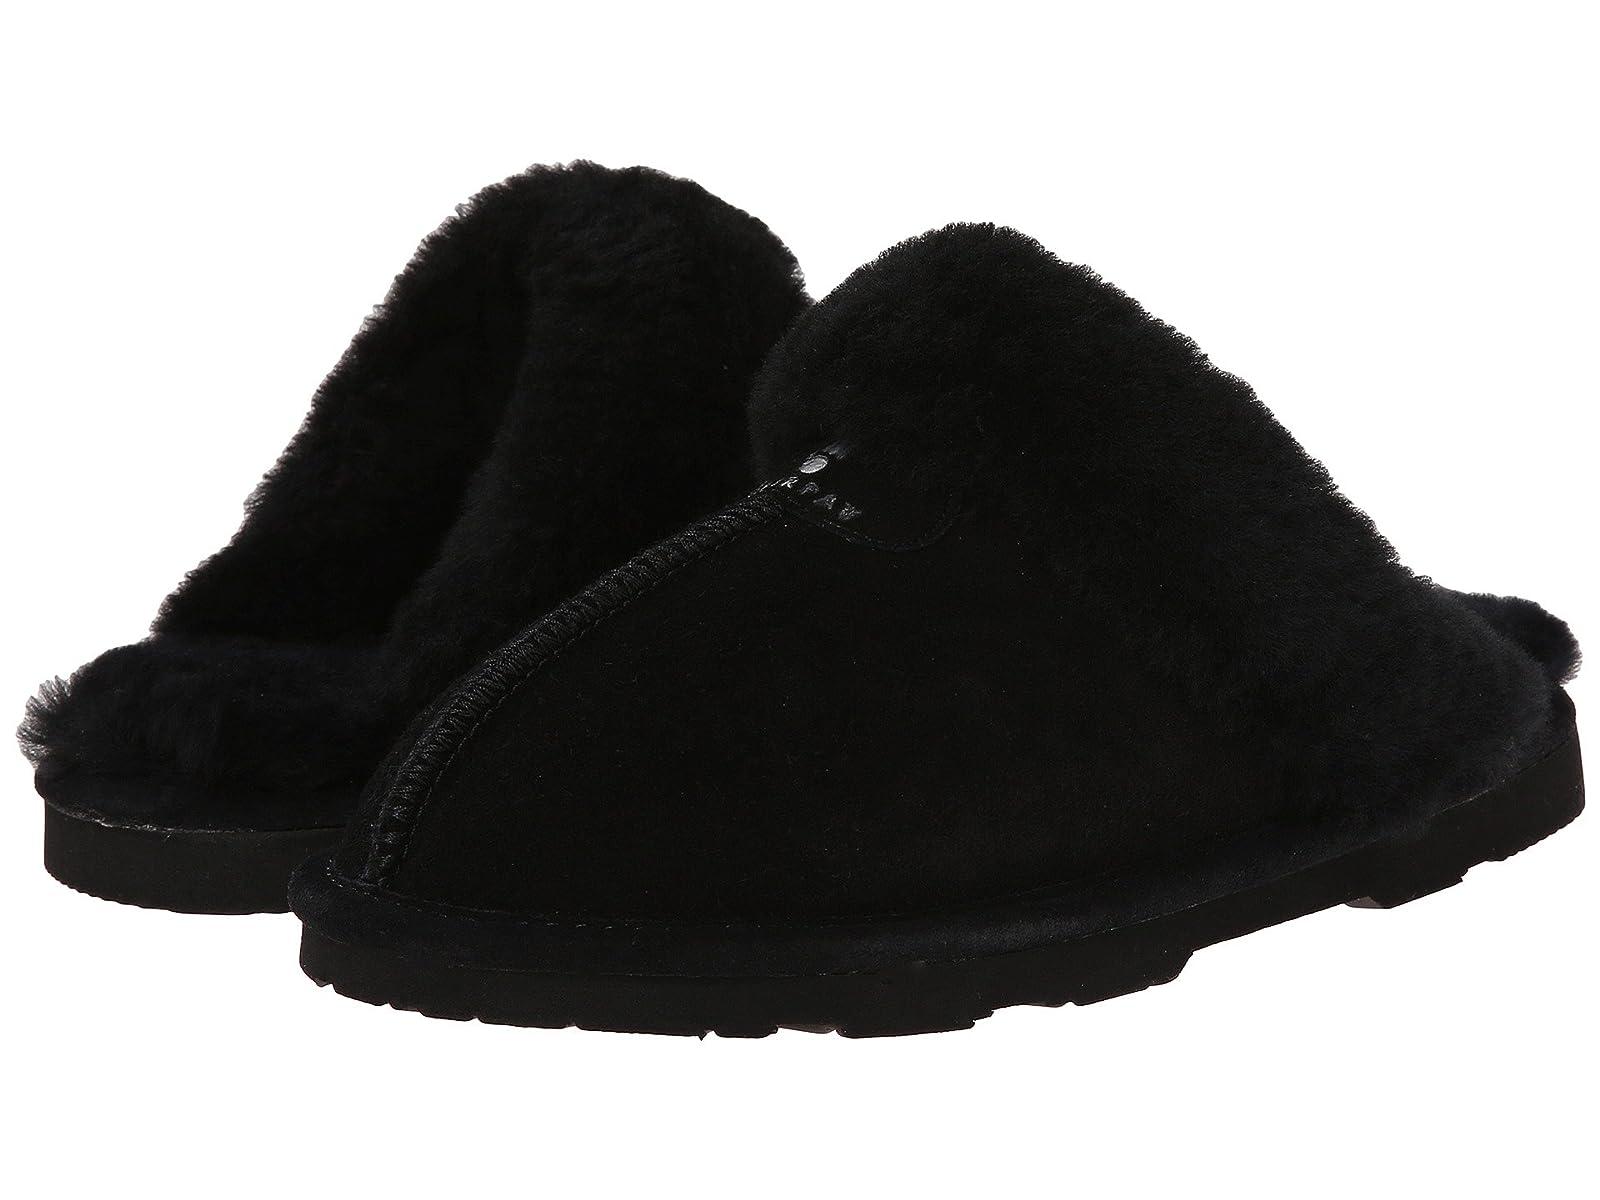 Bearpaw Loki IICheap and distinctive eye-catching shoes